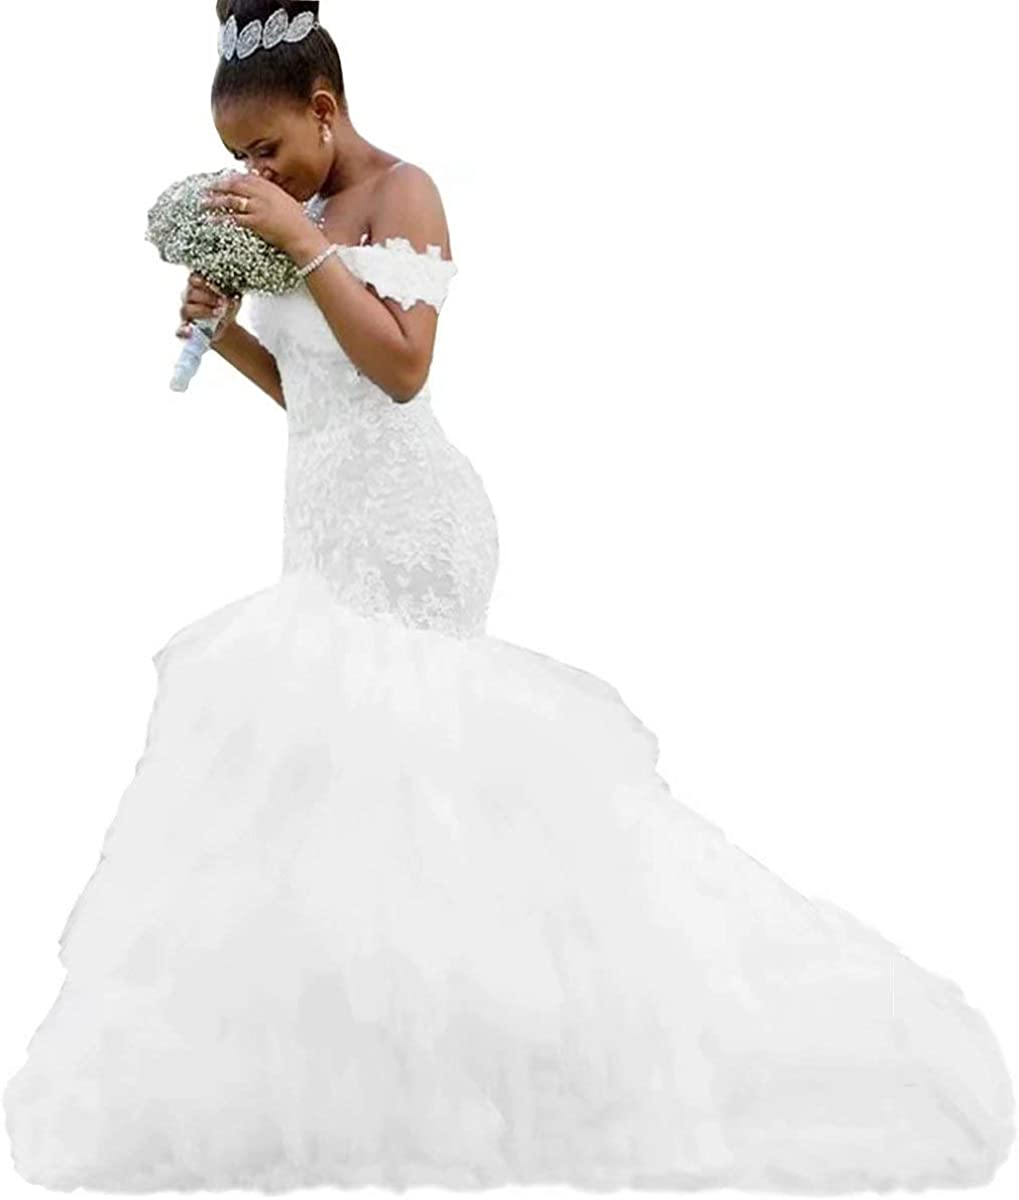 Yuxin Modest Mermaid Wedding Dresses Off Ruffles Shoulder Popular Ranking TOP5 brand 2021 T